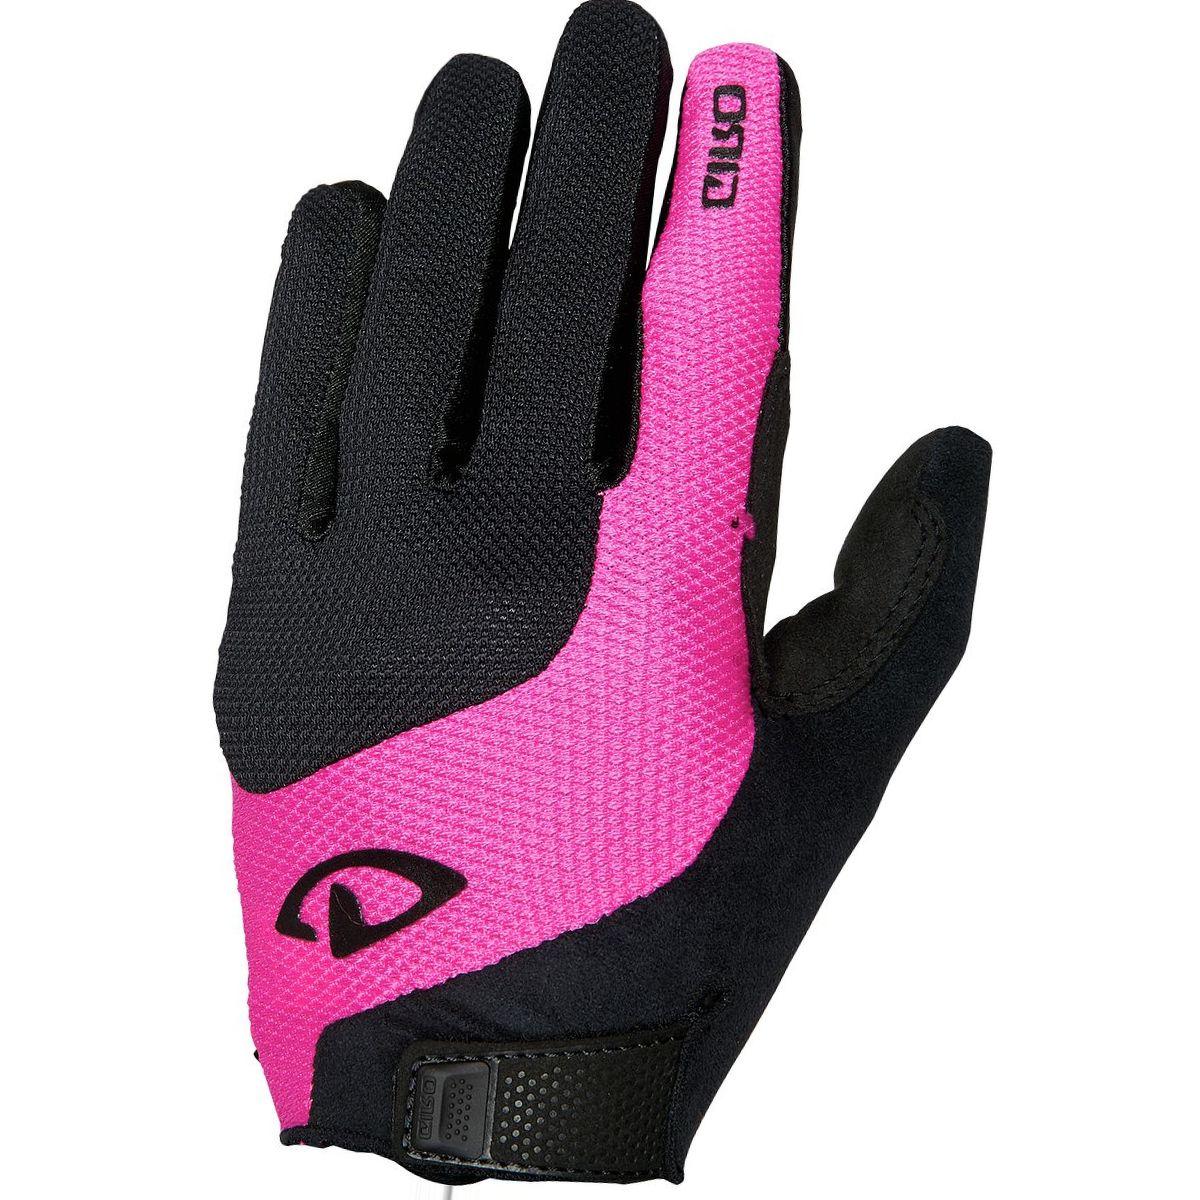 Giro Tessa Gel LF Glove - Women's